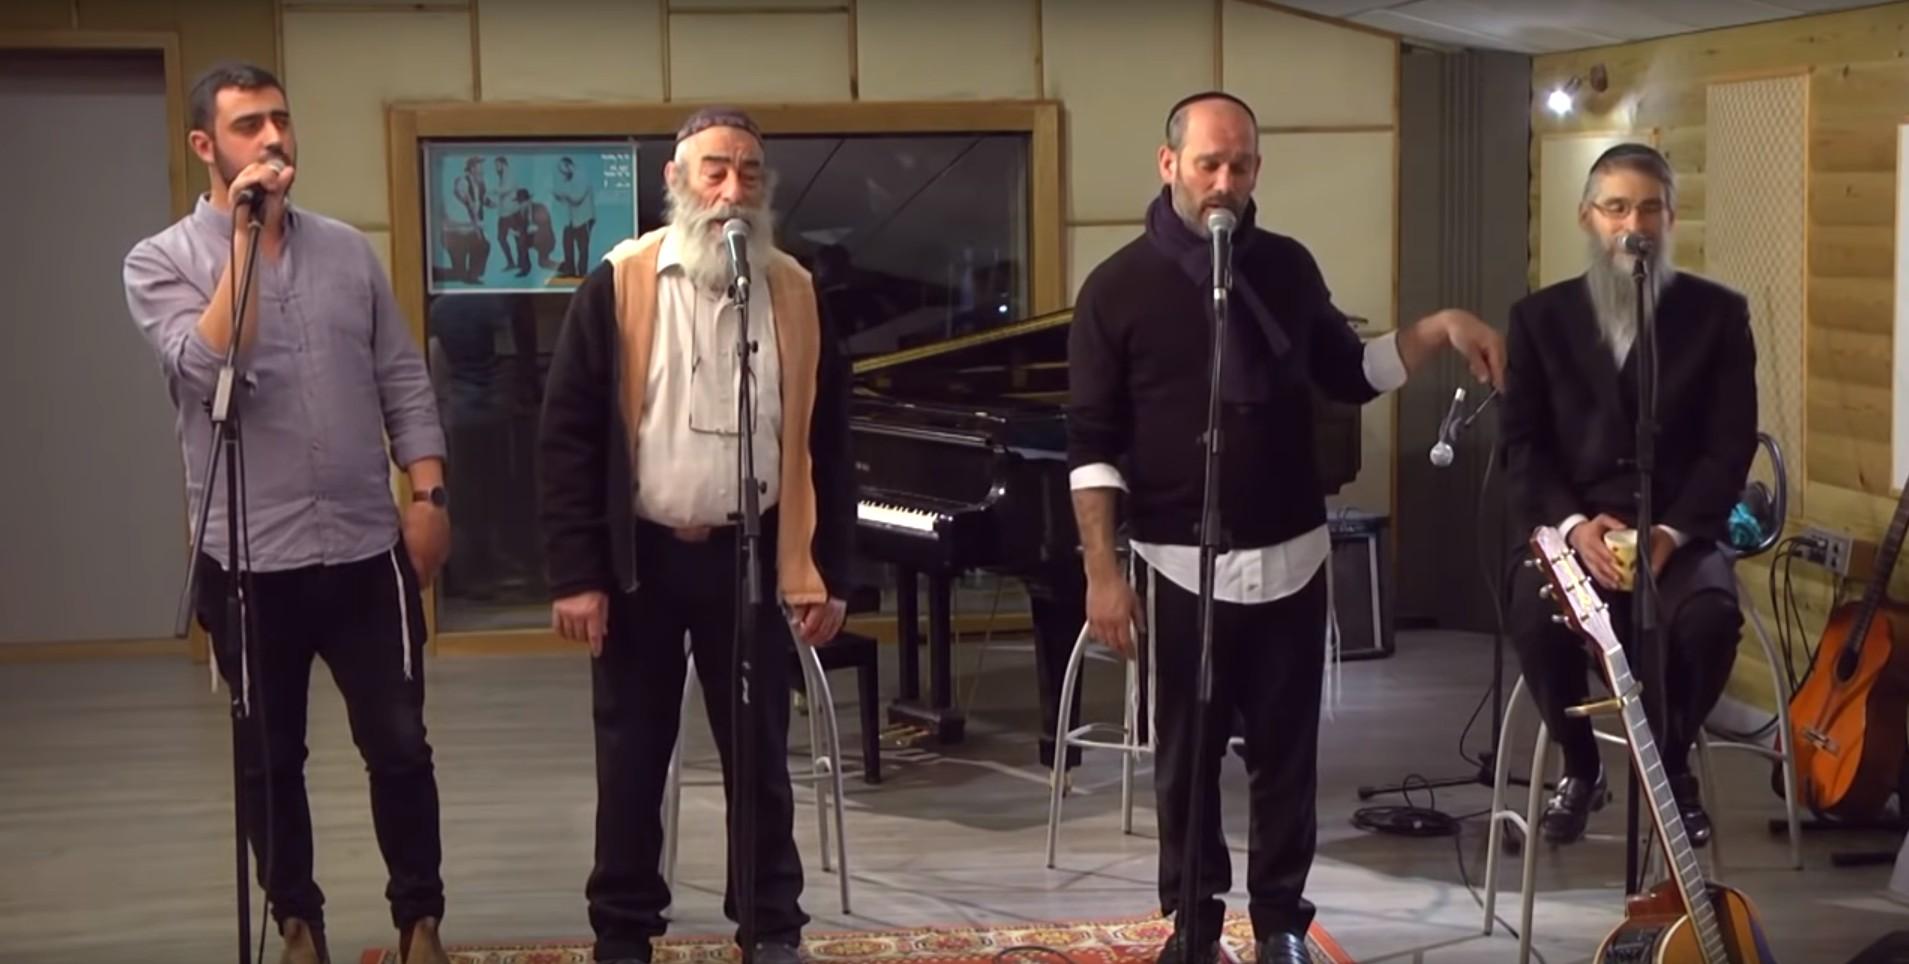 Photo of Avraham Fried, Yonatan Razel, Ishay Ribo & Ariel Zilber Rehearse for Concert